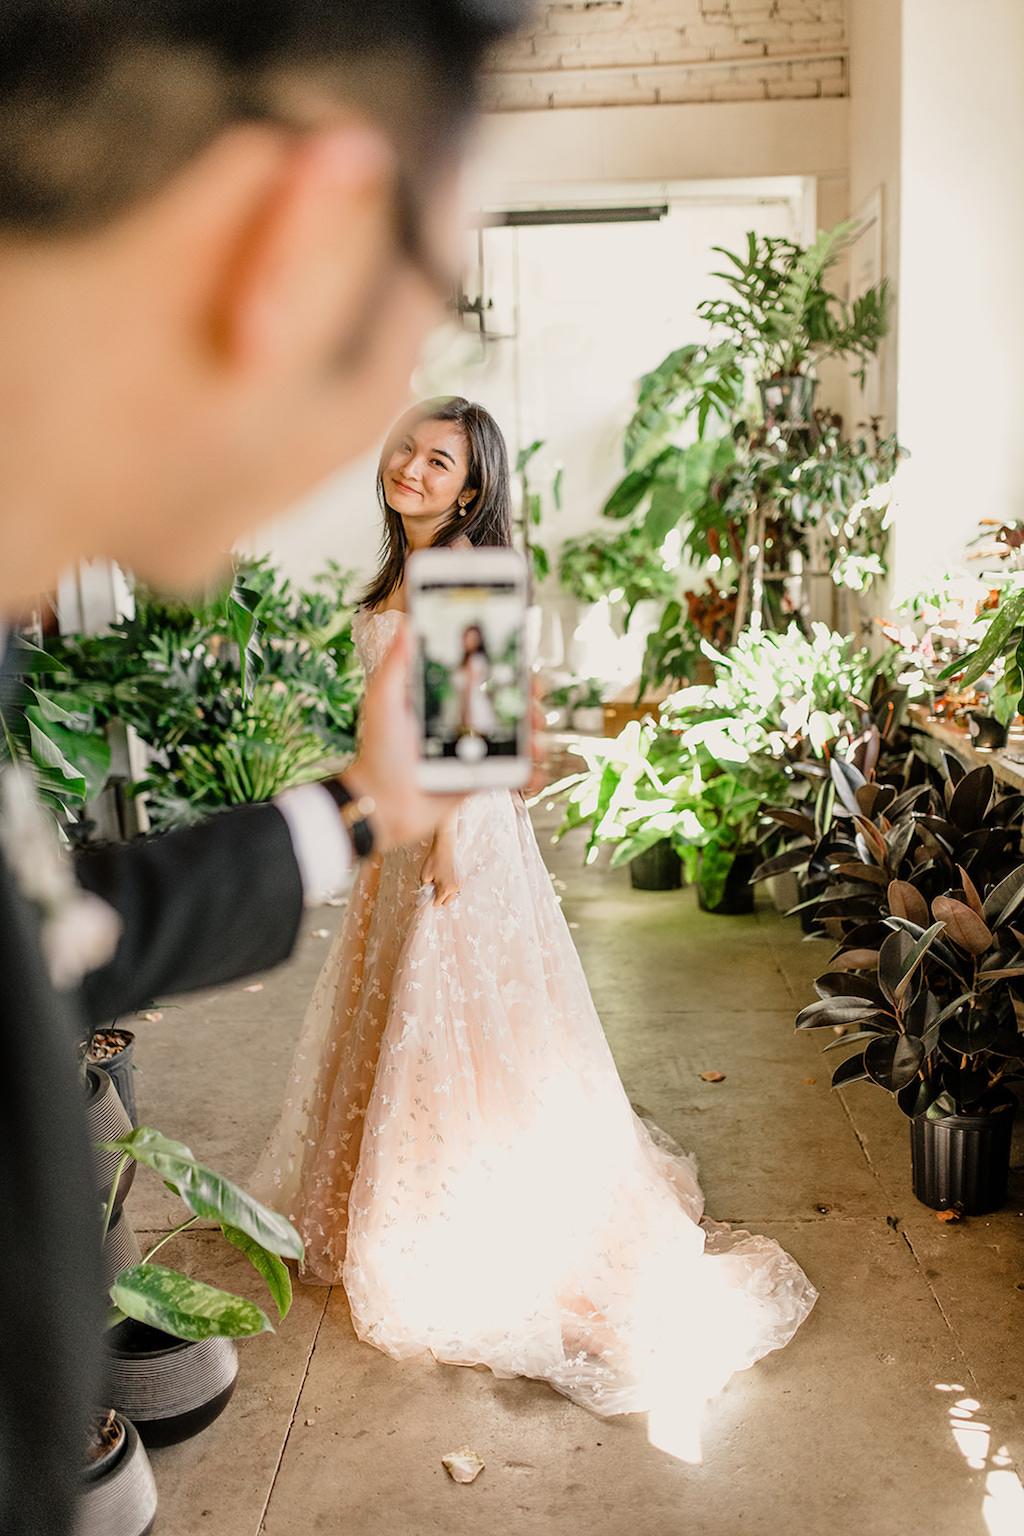 Bride and Groom Creative First Look Indoor Portrait, Bride in Peach Textured Wedding Dress